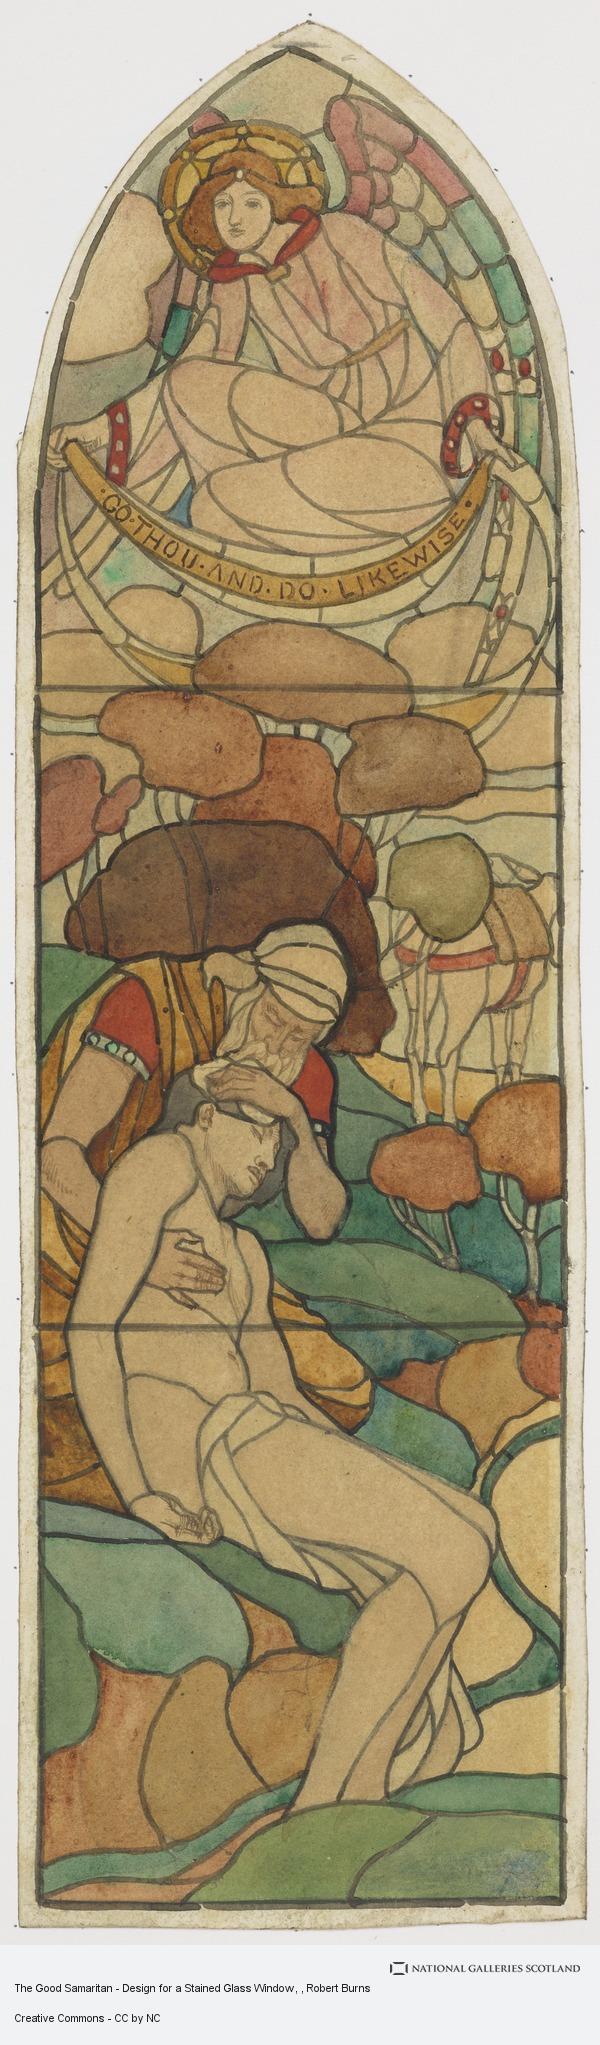 Robert Burns, The Good Samaritan - Design for a Stained Glass Window